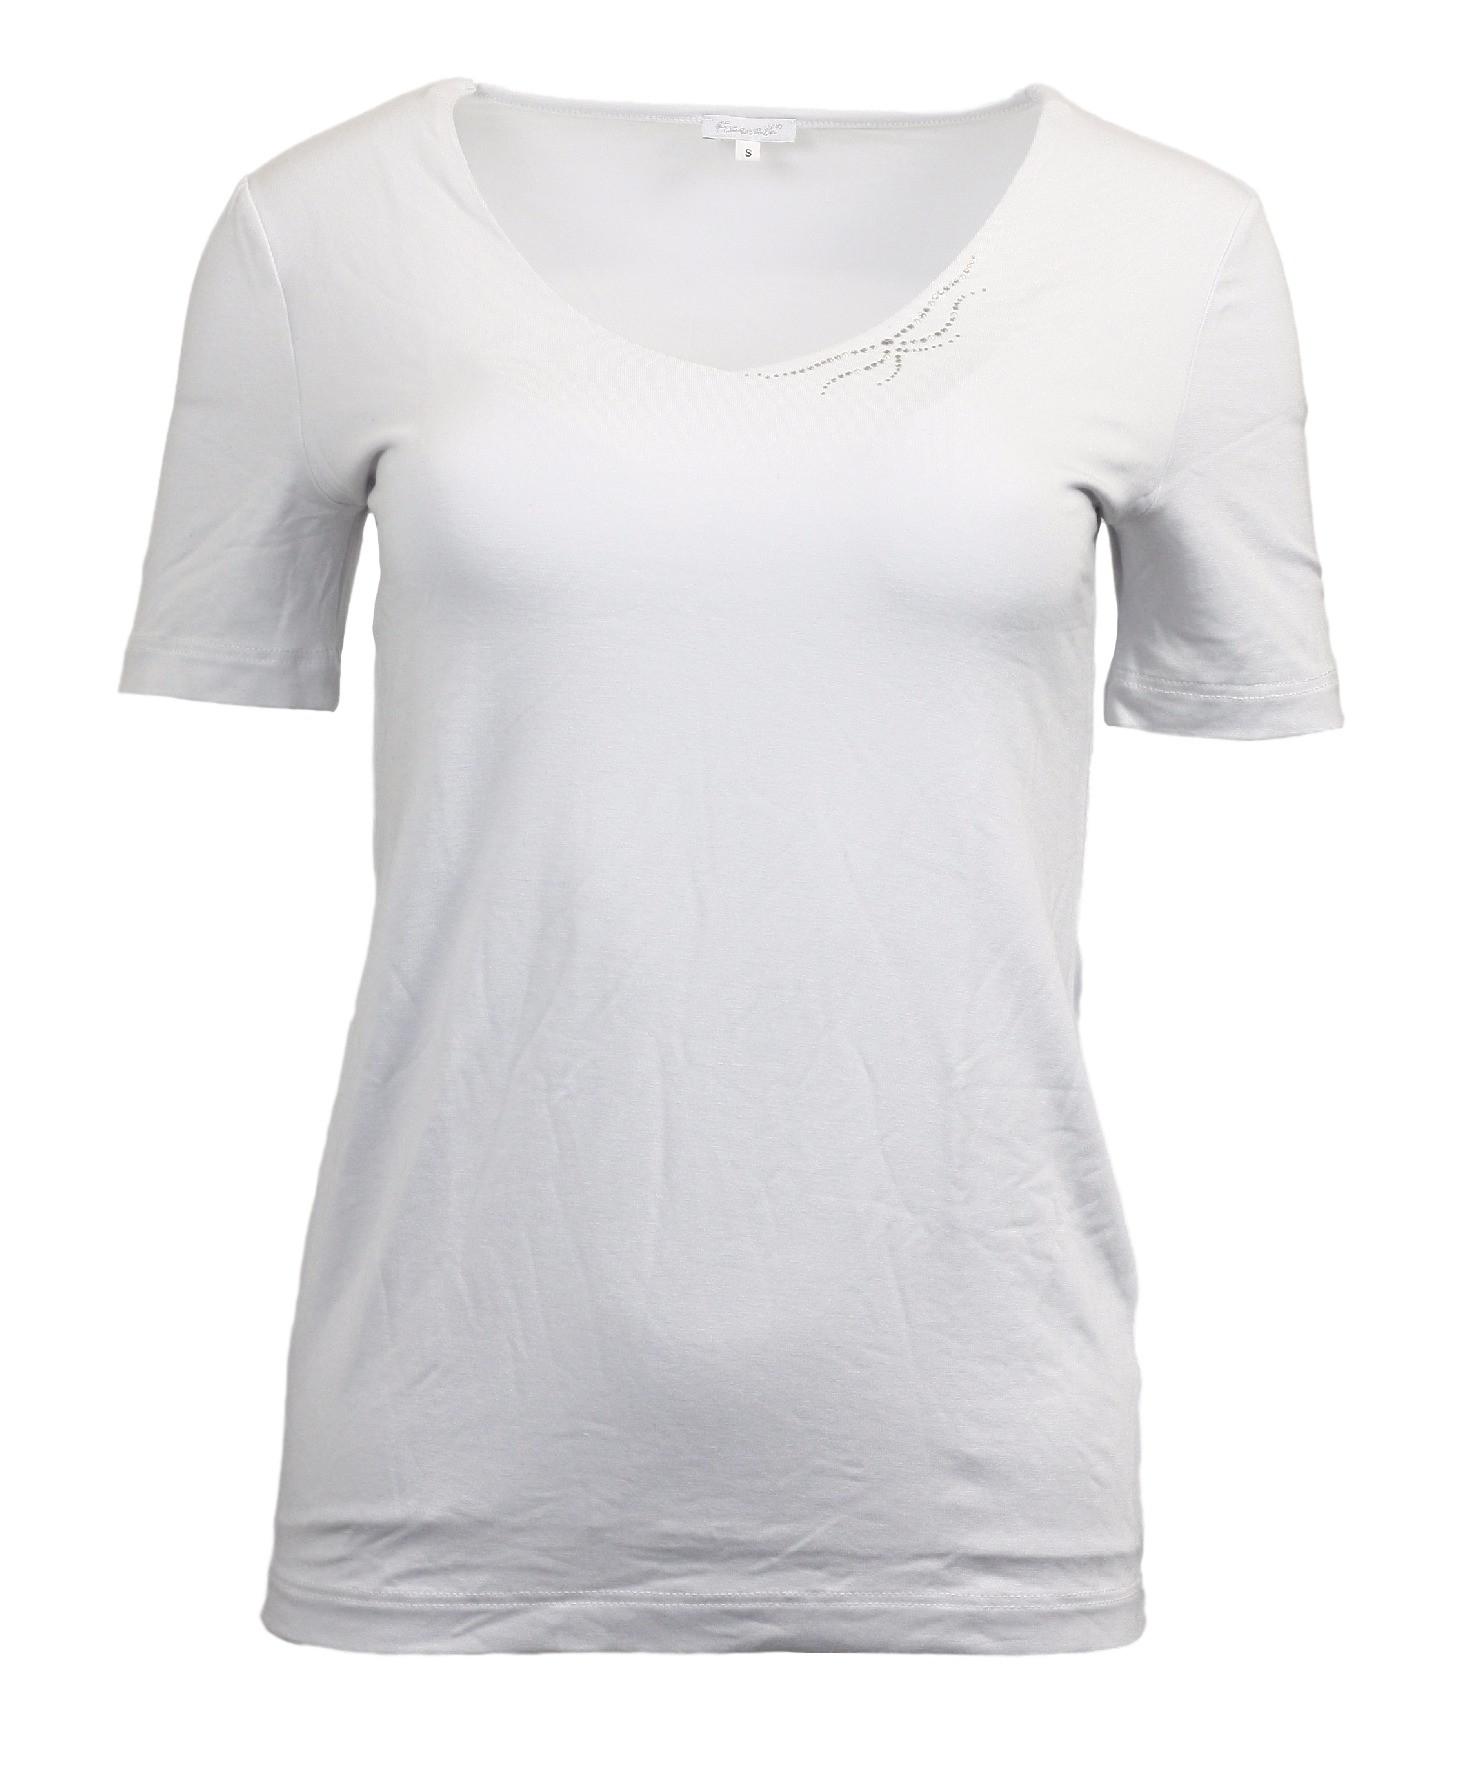 Dámské tričko Linaka kr - Favab bílá L